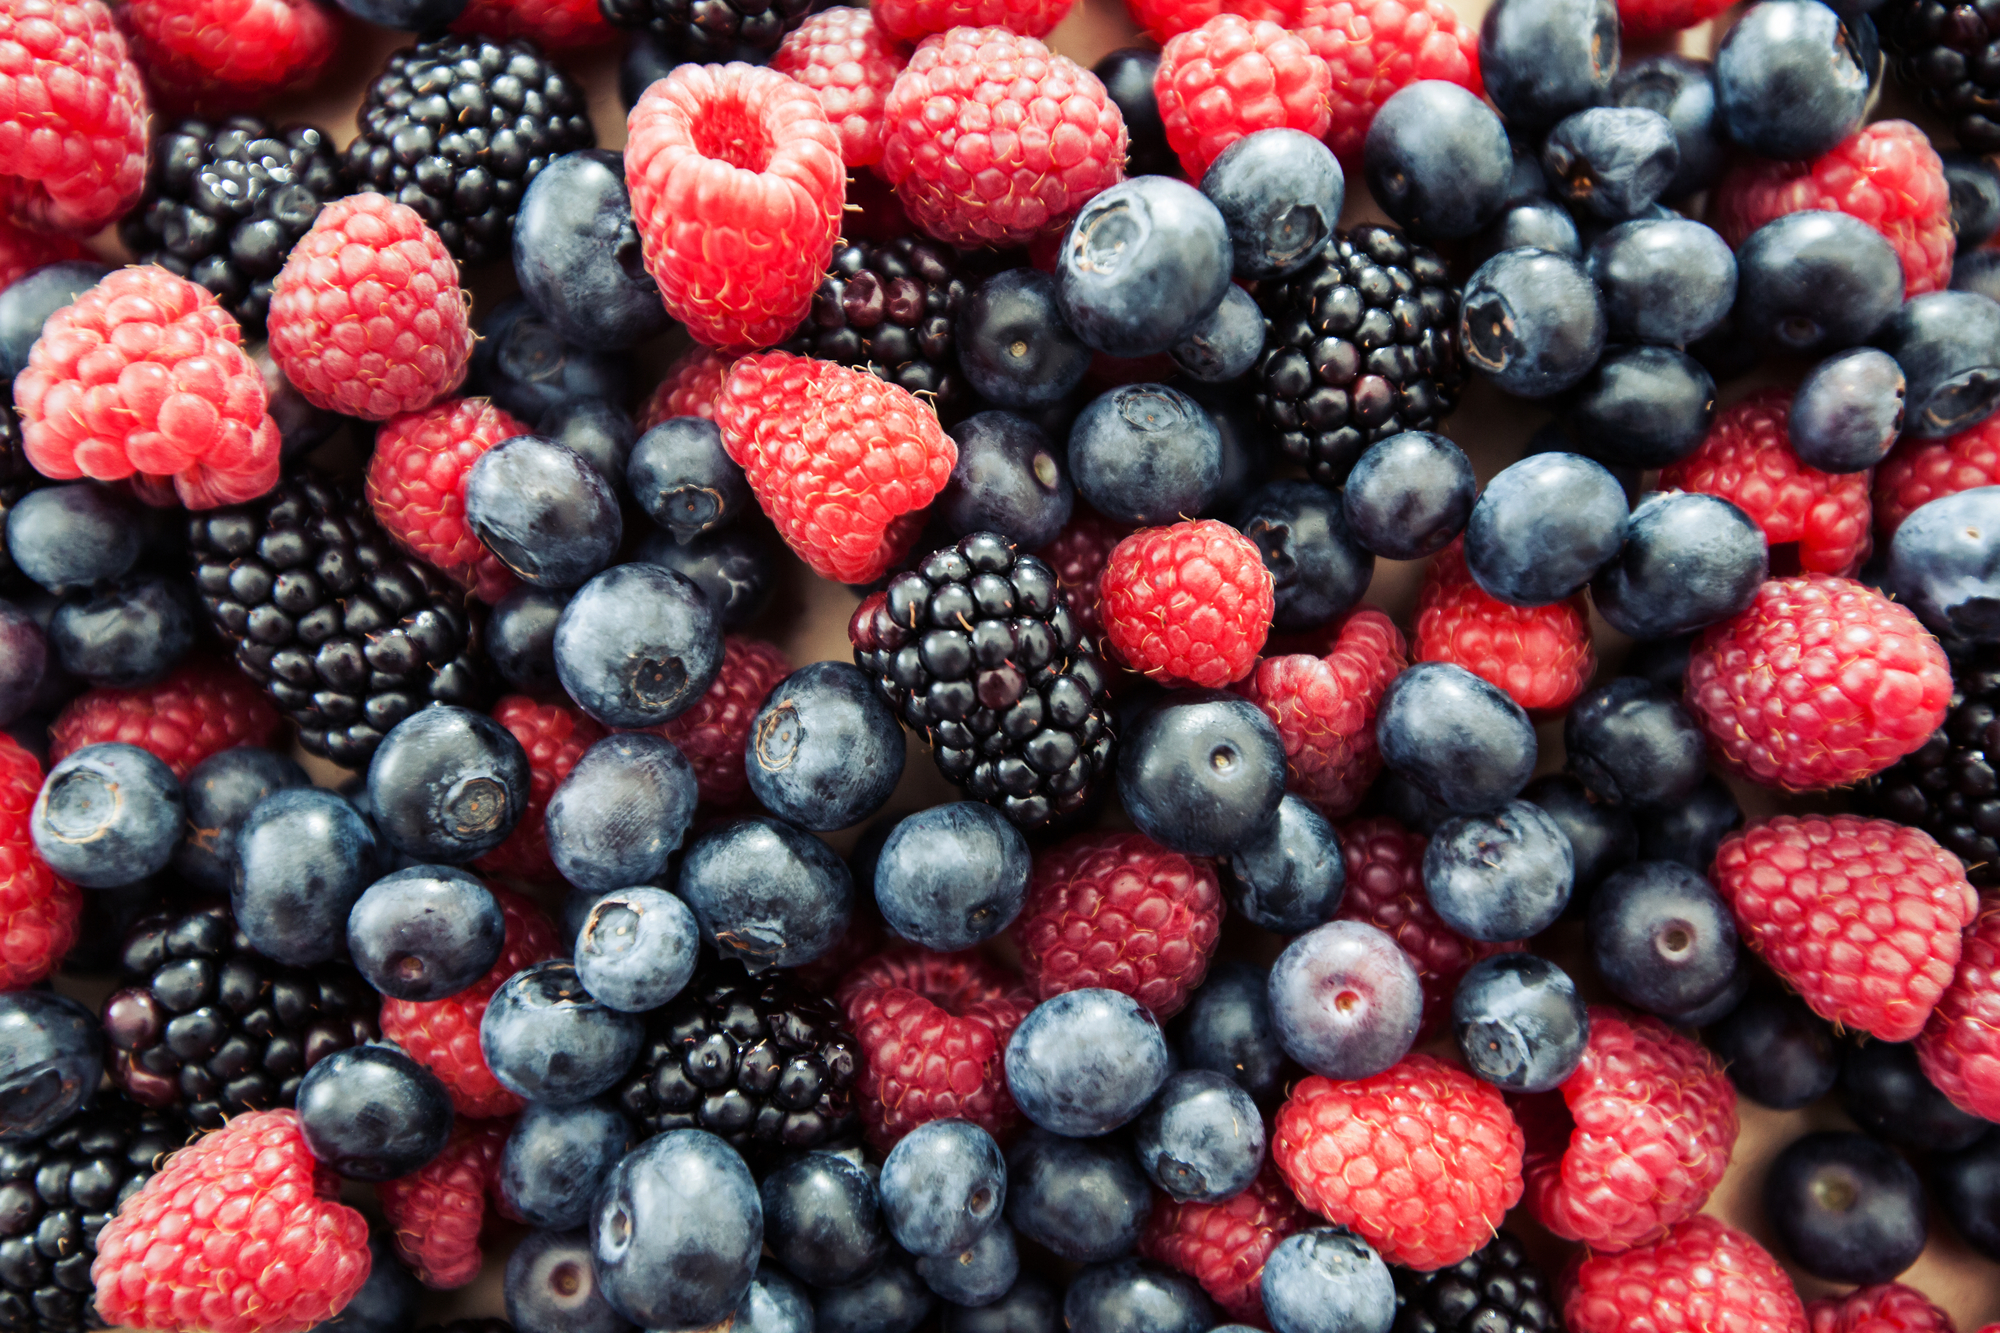 fresh antioxidant food raspberry blueberry blackberry